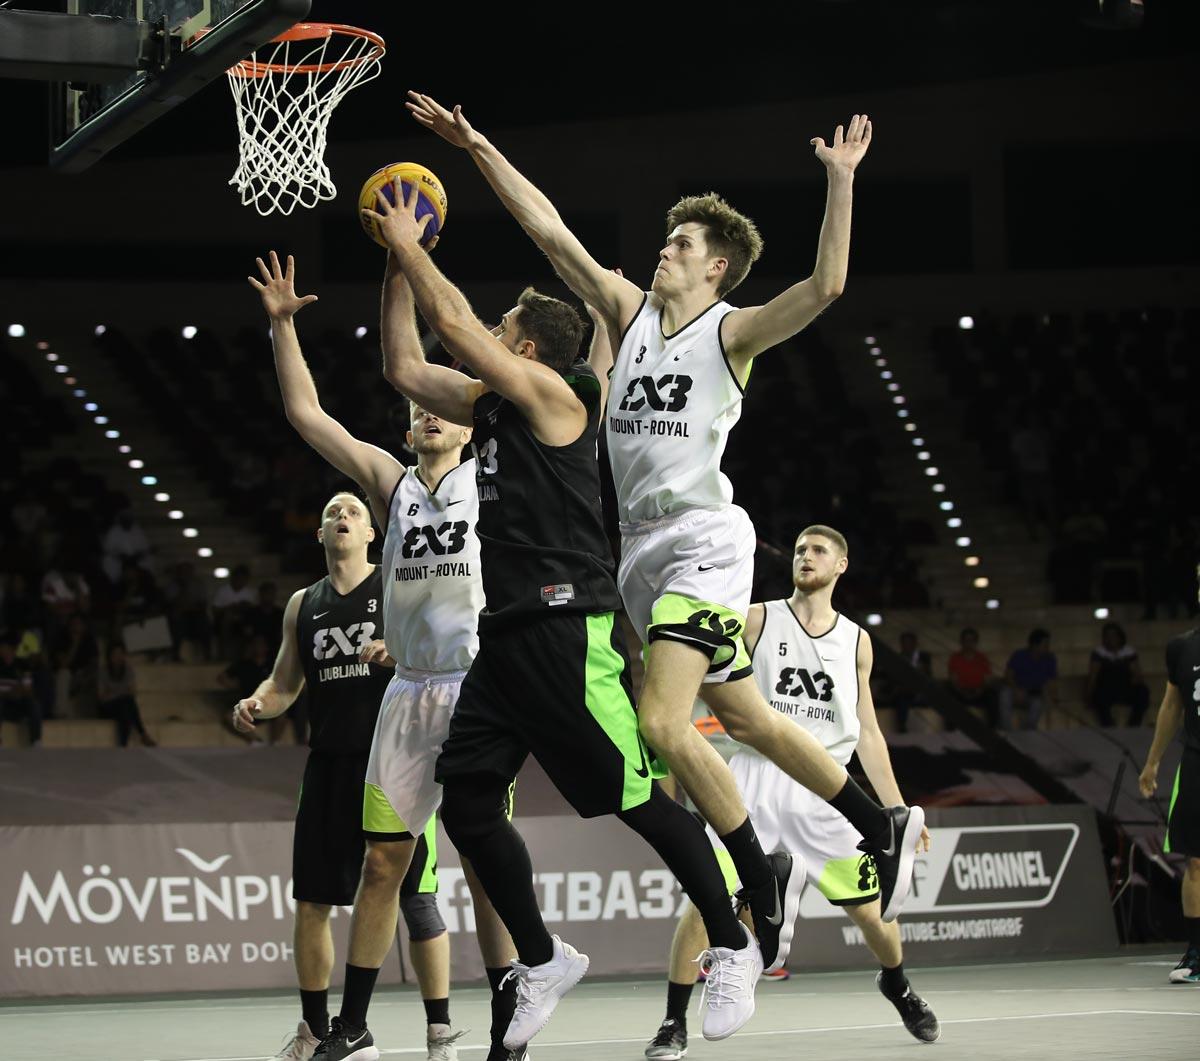 University World Cup runners-up cut their teeth on FIBA 3x3 World Tour